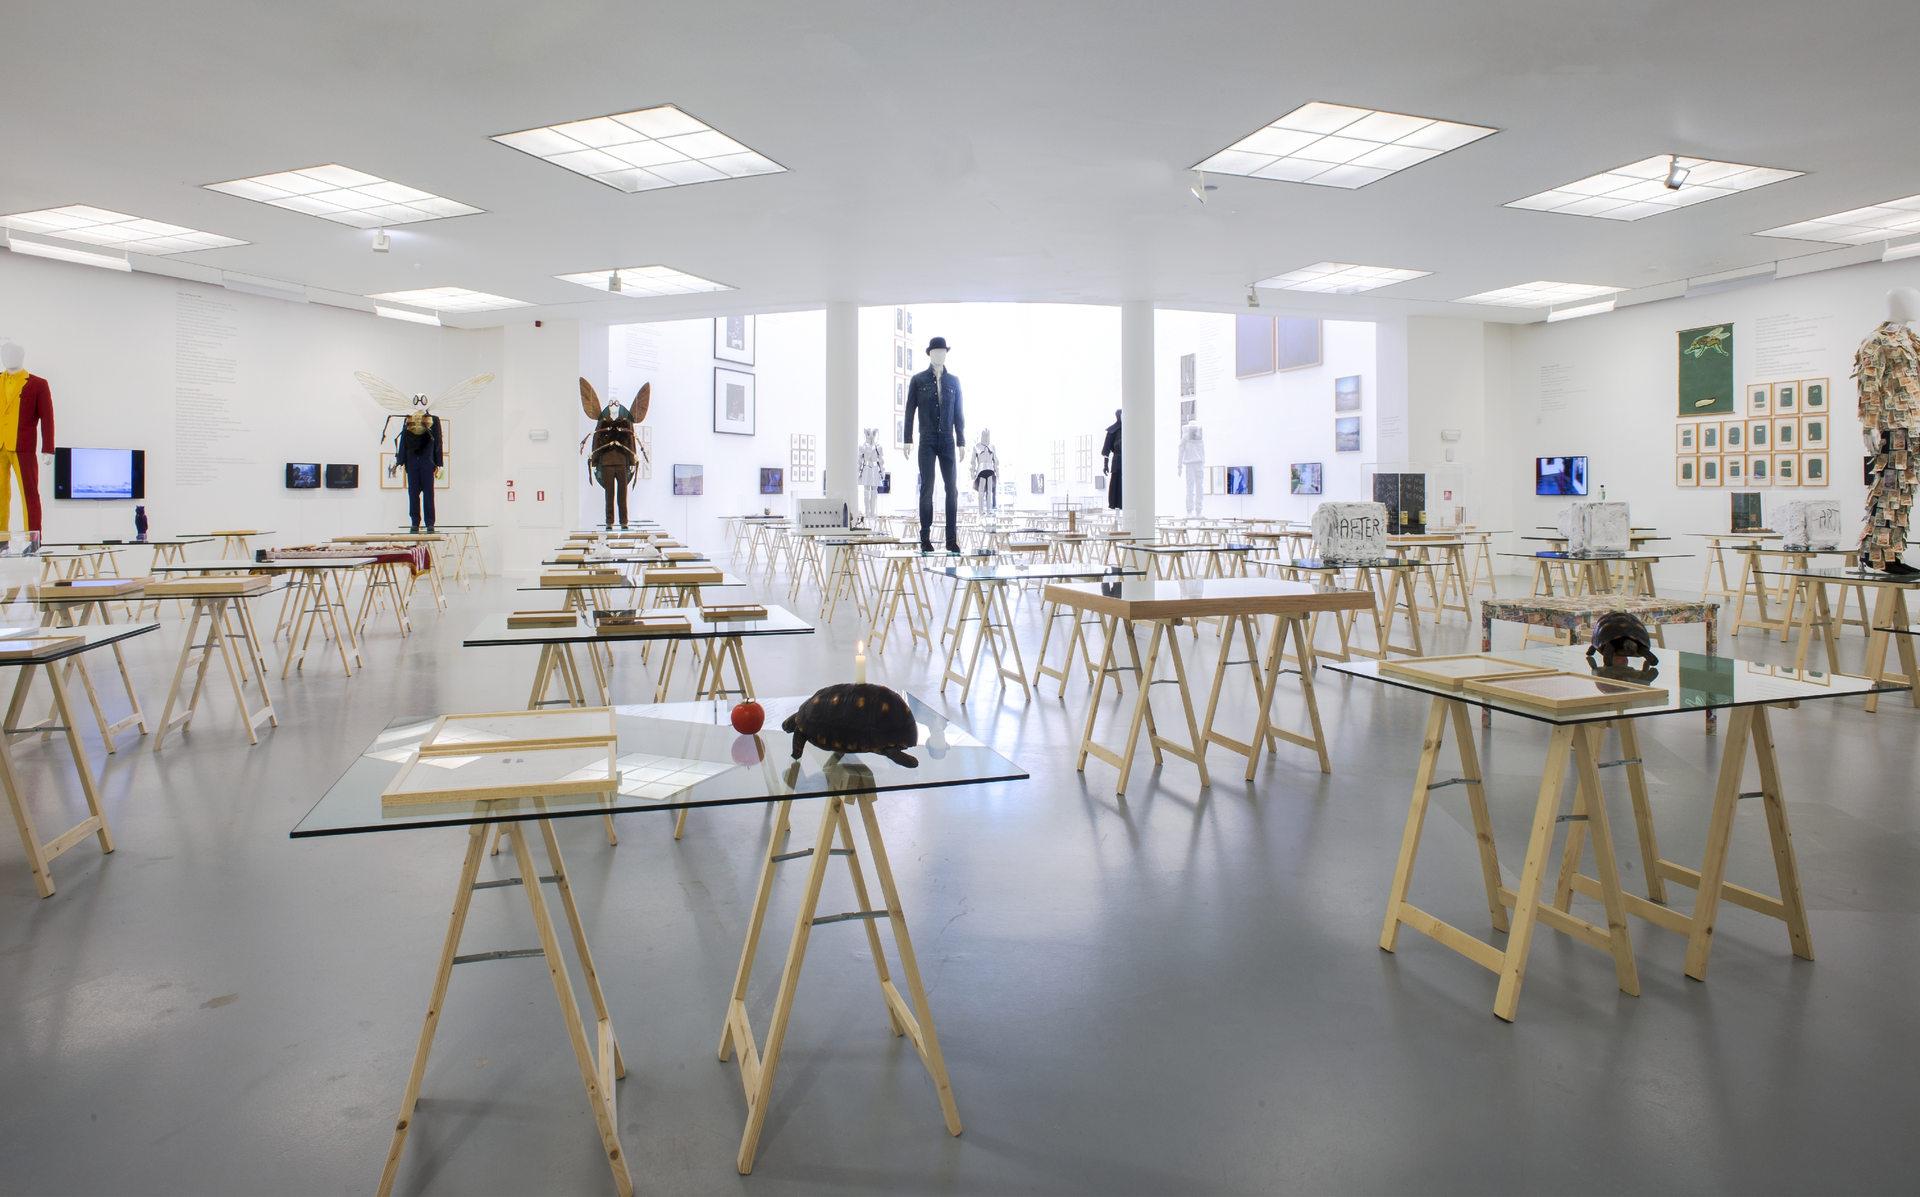 Jan_Fabre,_exhibition_view_M_HKA_2015_photo_M_HKAclinckx19